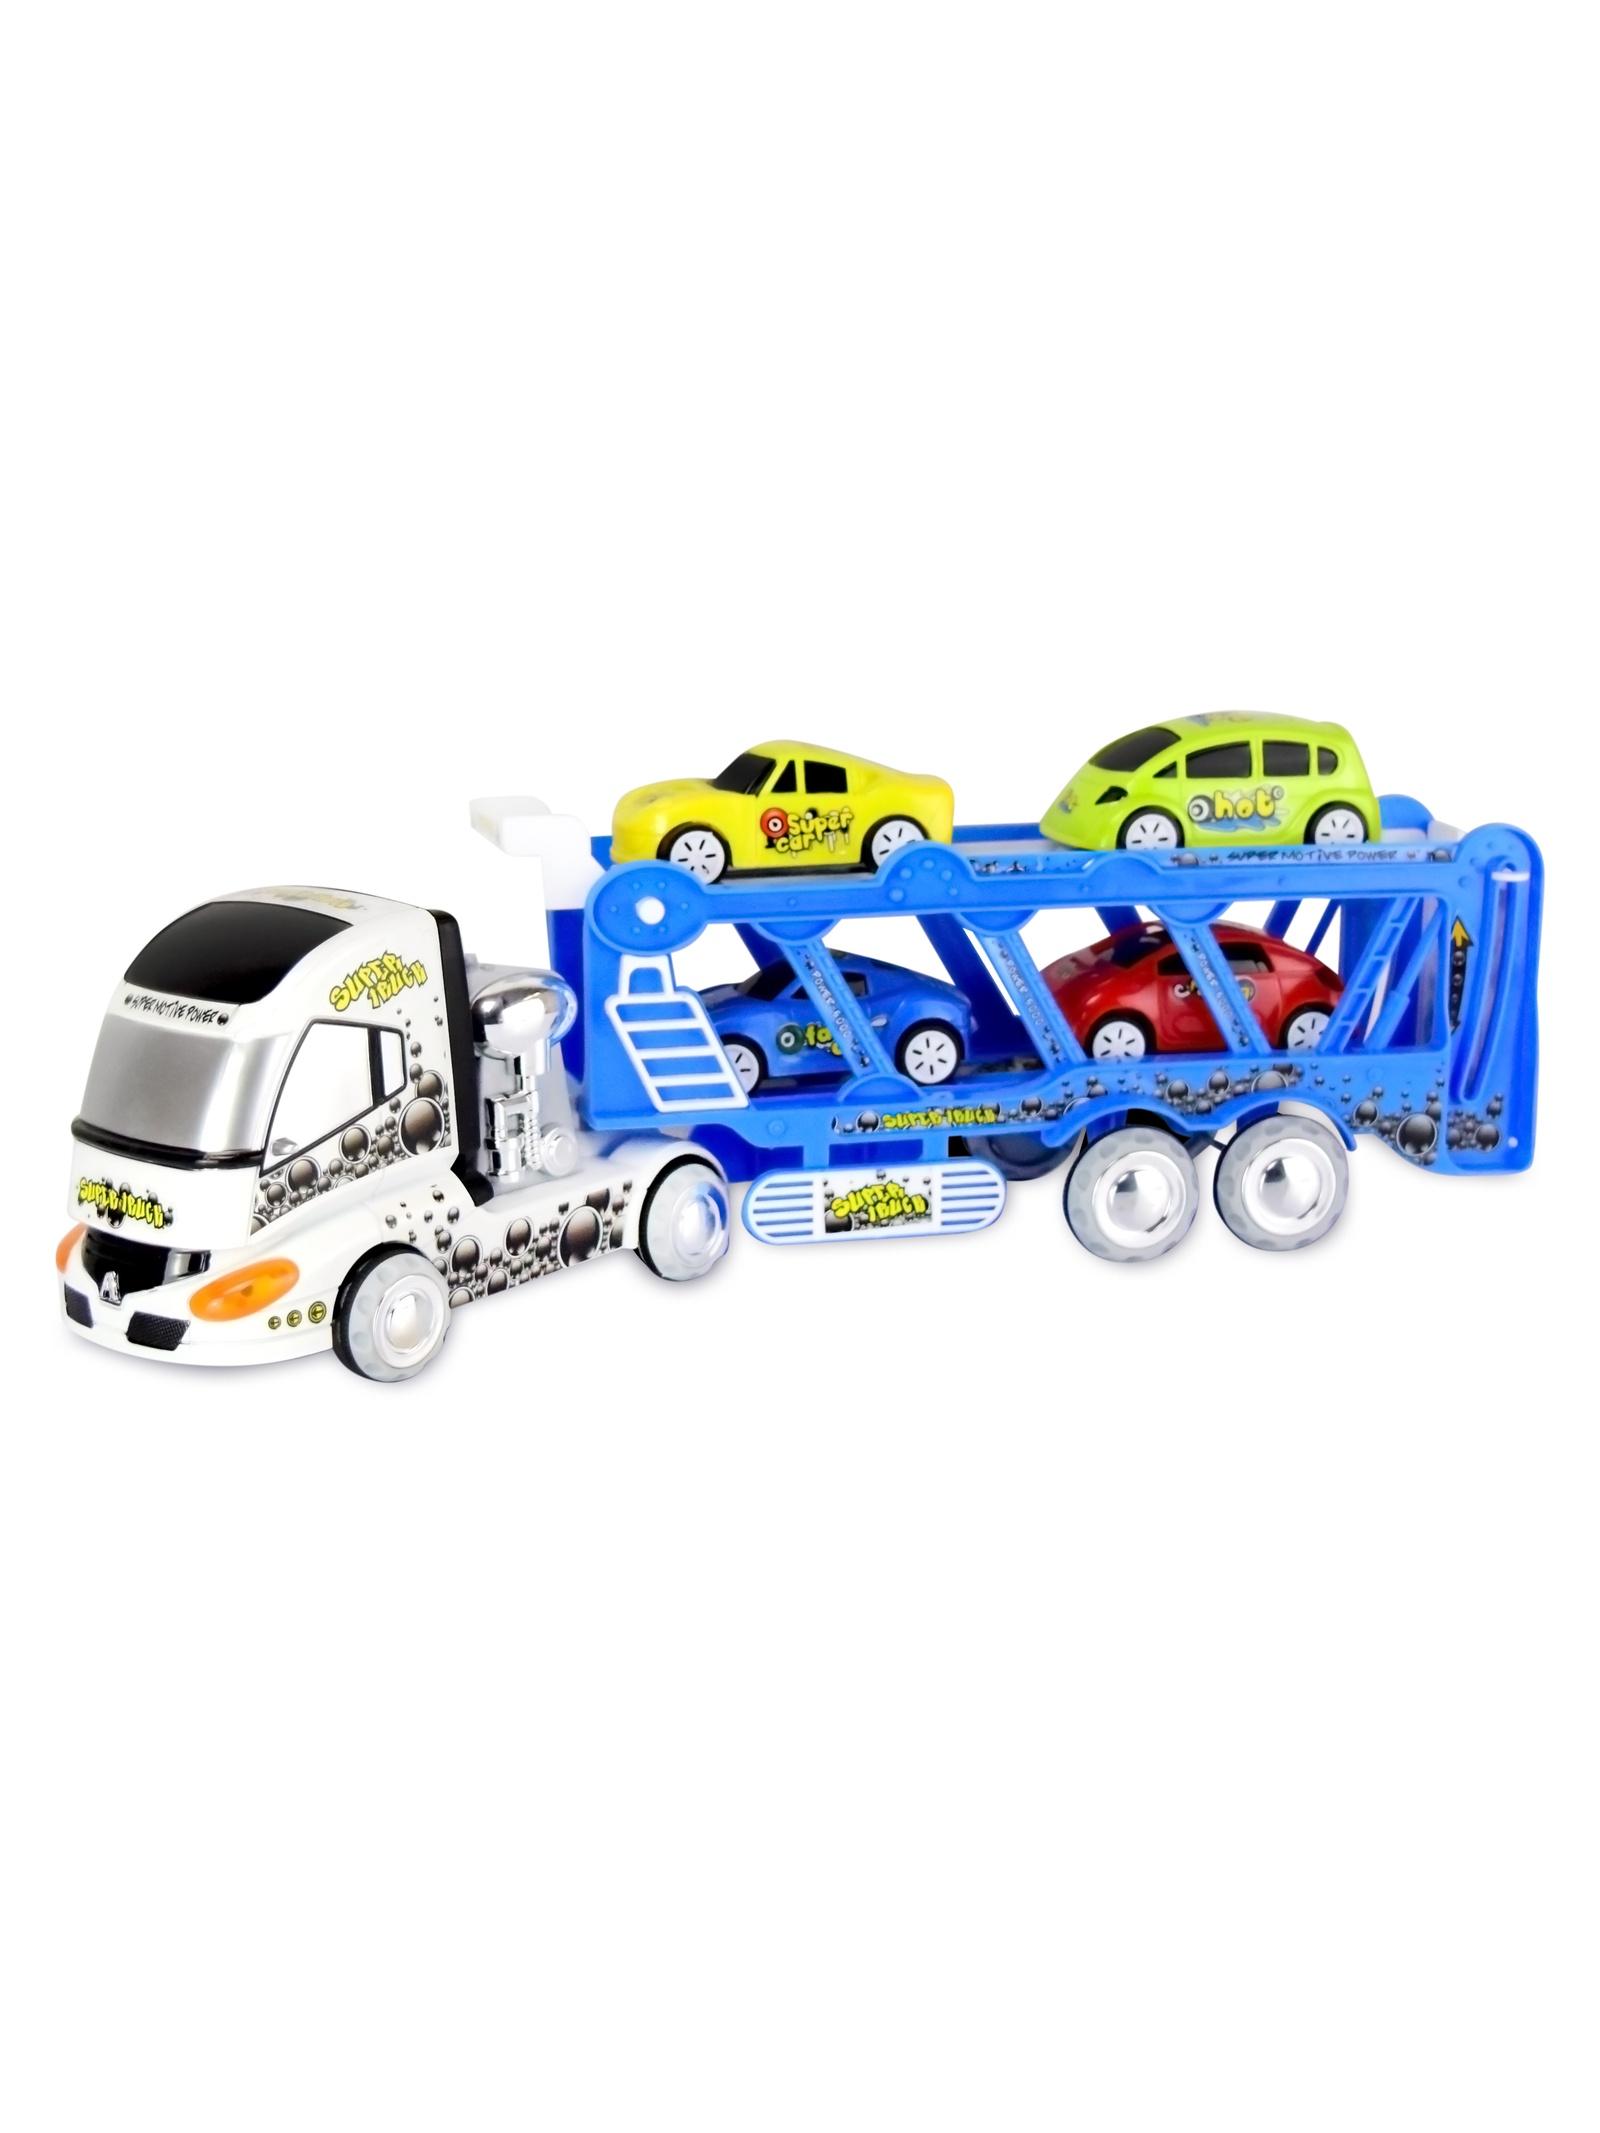 Трейлер с машинами JT Toys, 3315/синий подарок трейлер